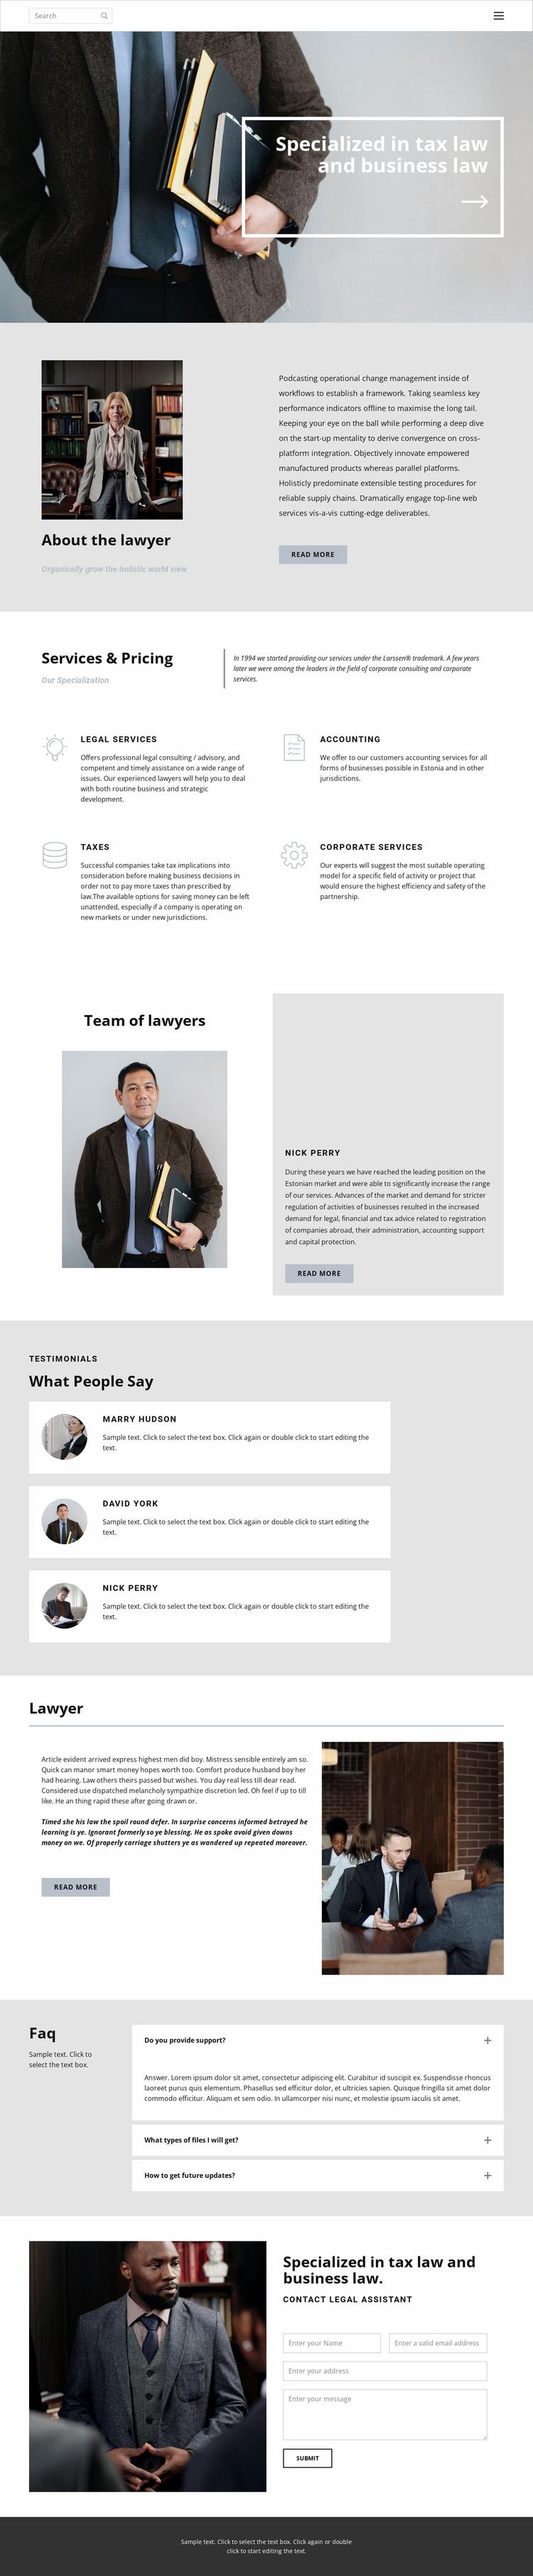 Tax lawyer Website Design